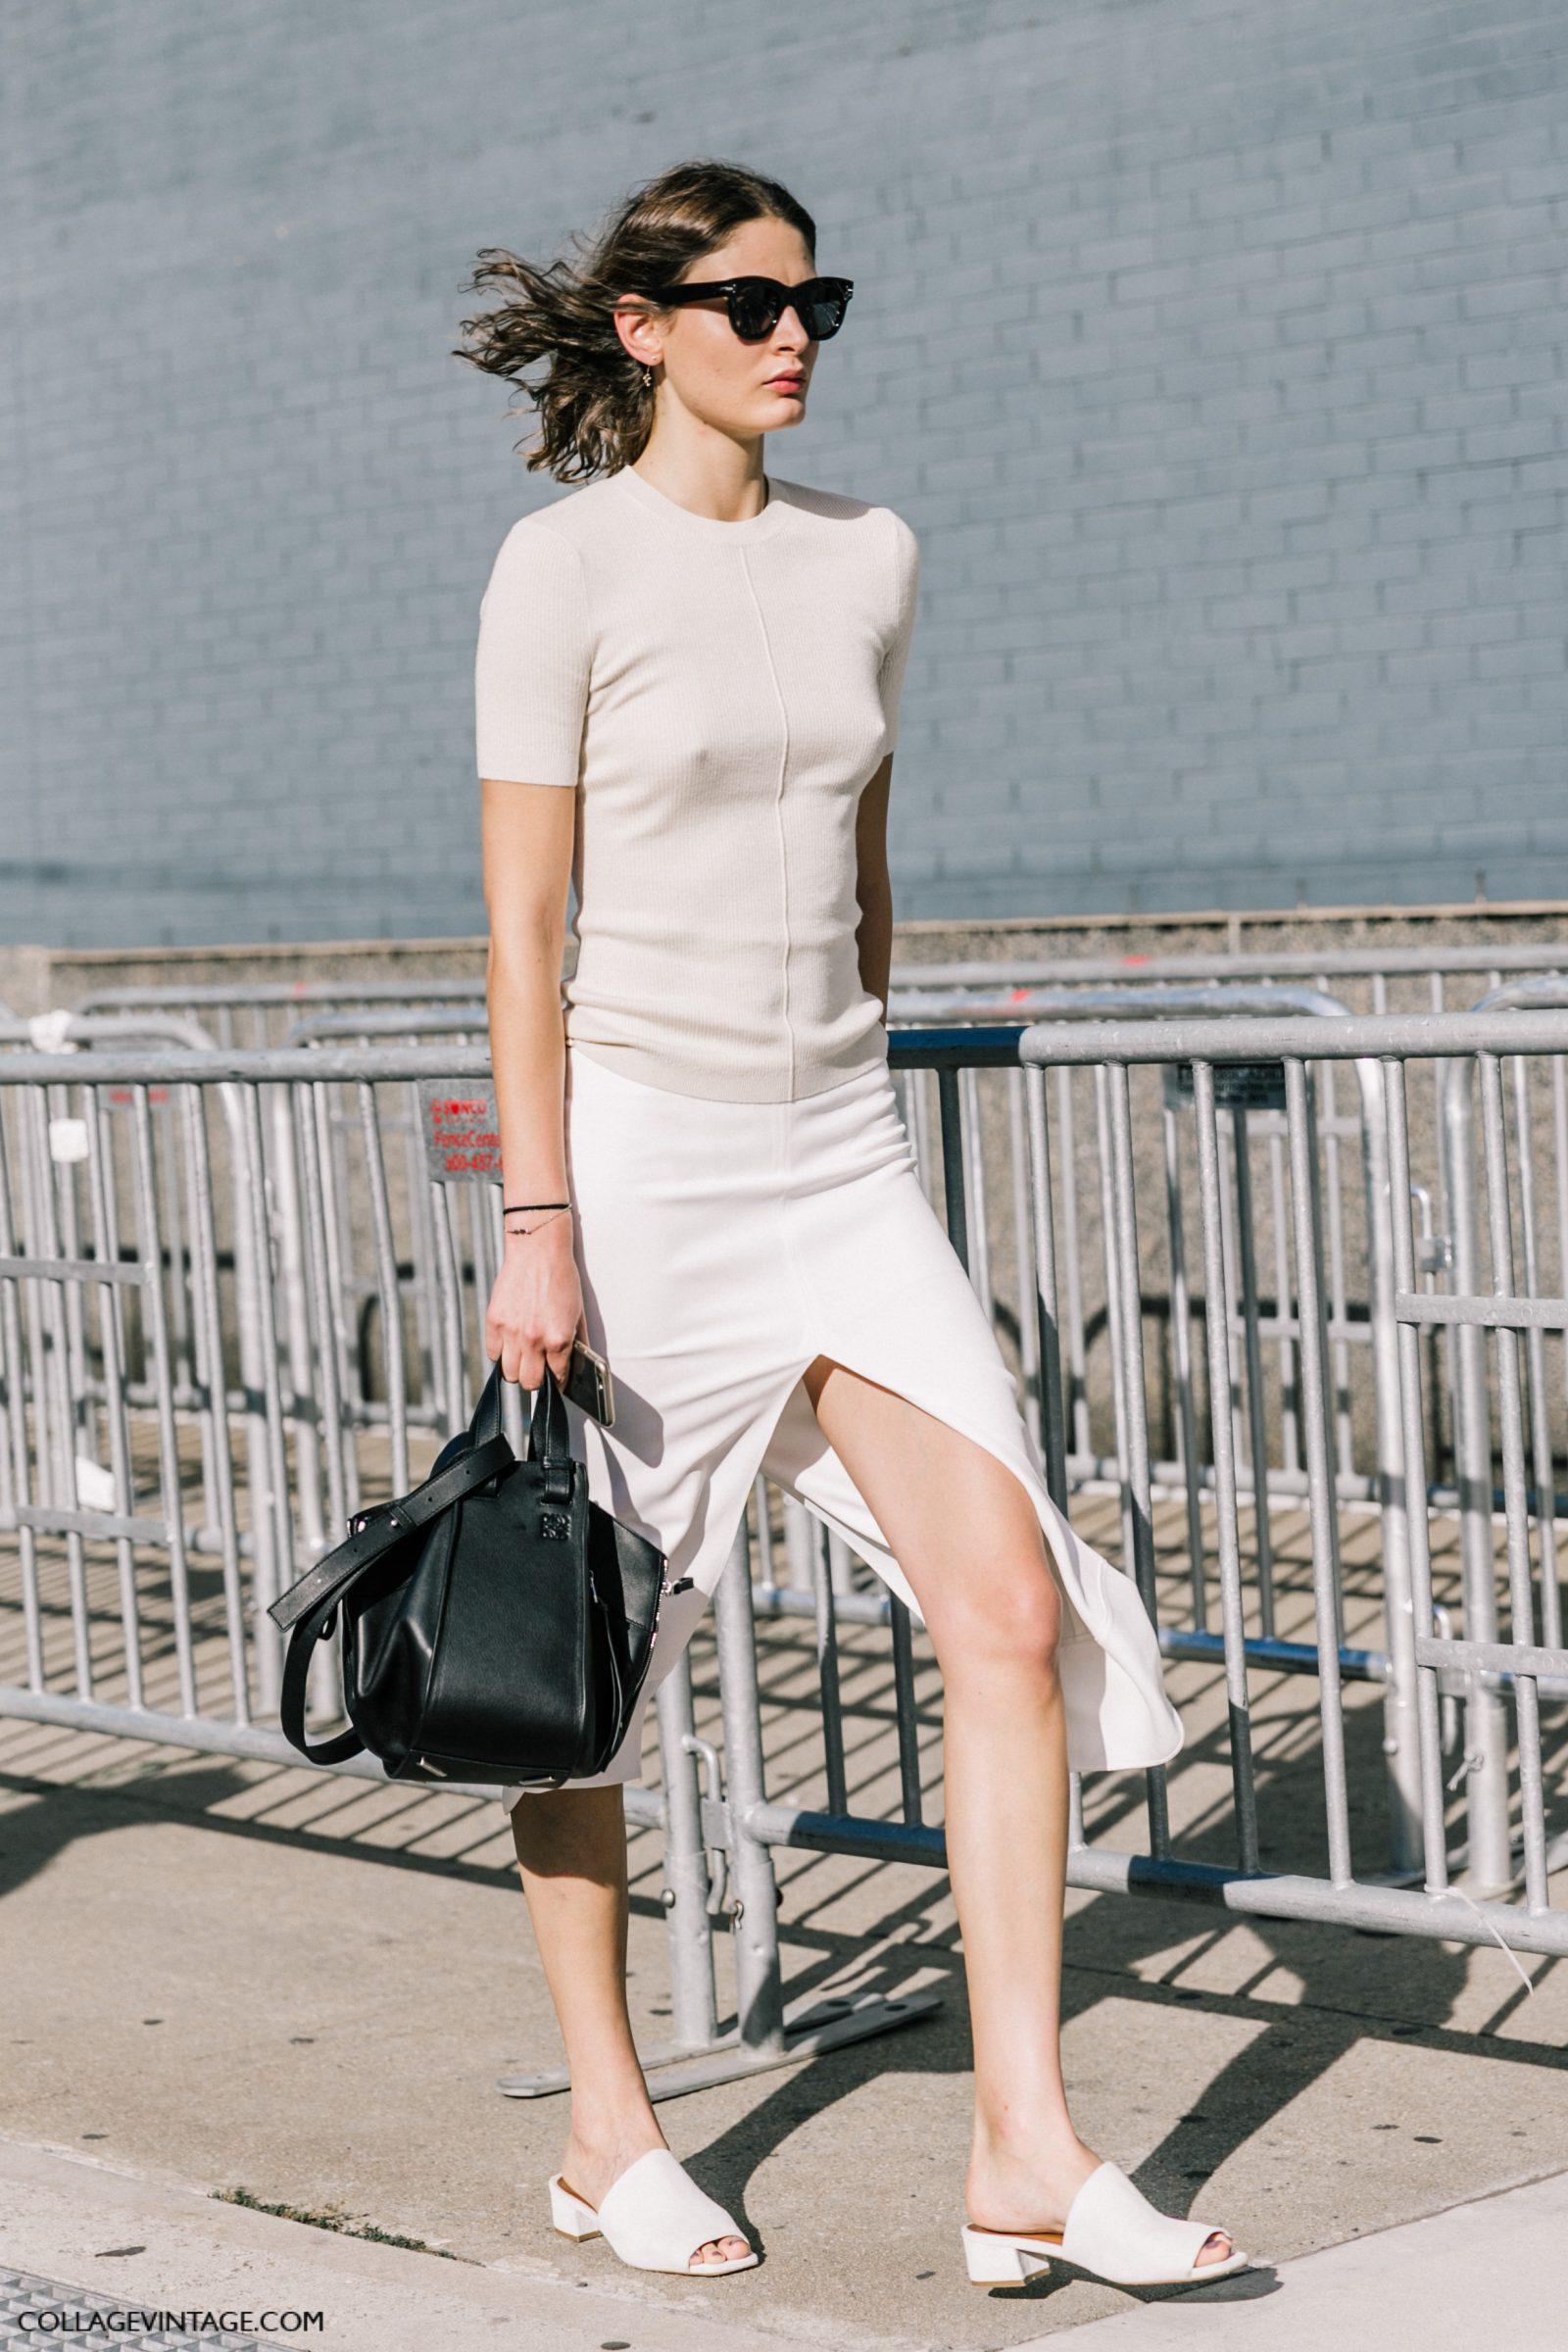 nyfw-new_york_fashion_week_ss17-street_style-outfits-collage_vintage-vintage-atuzarra-43